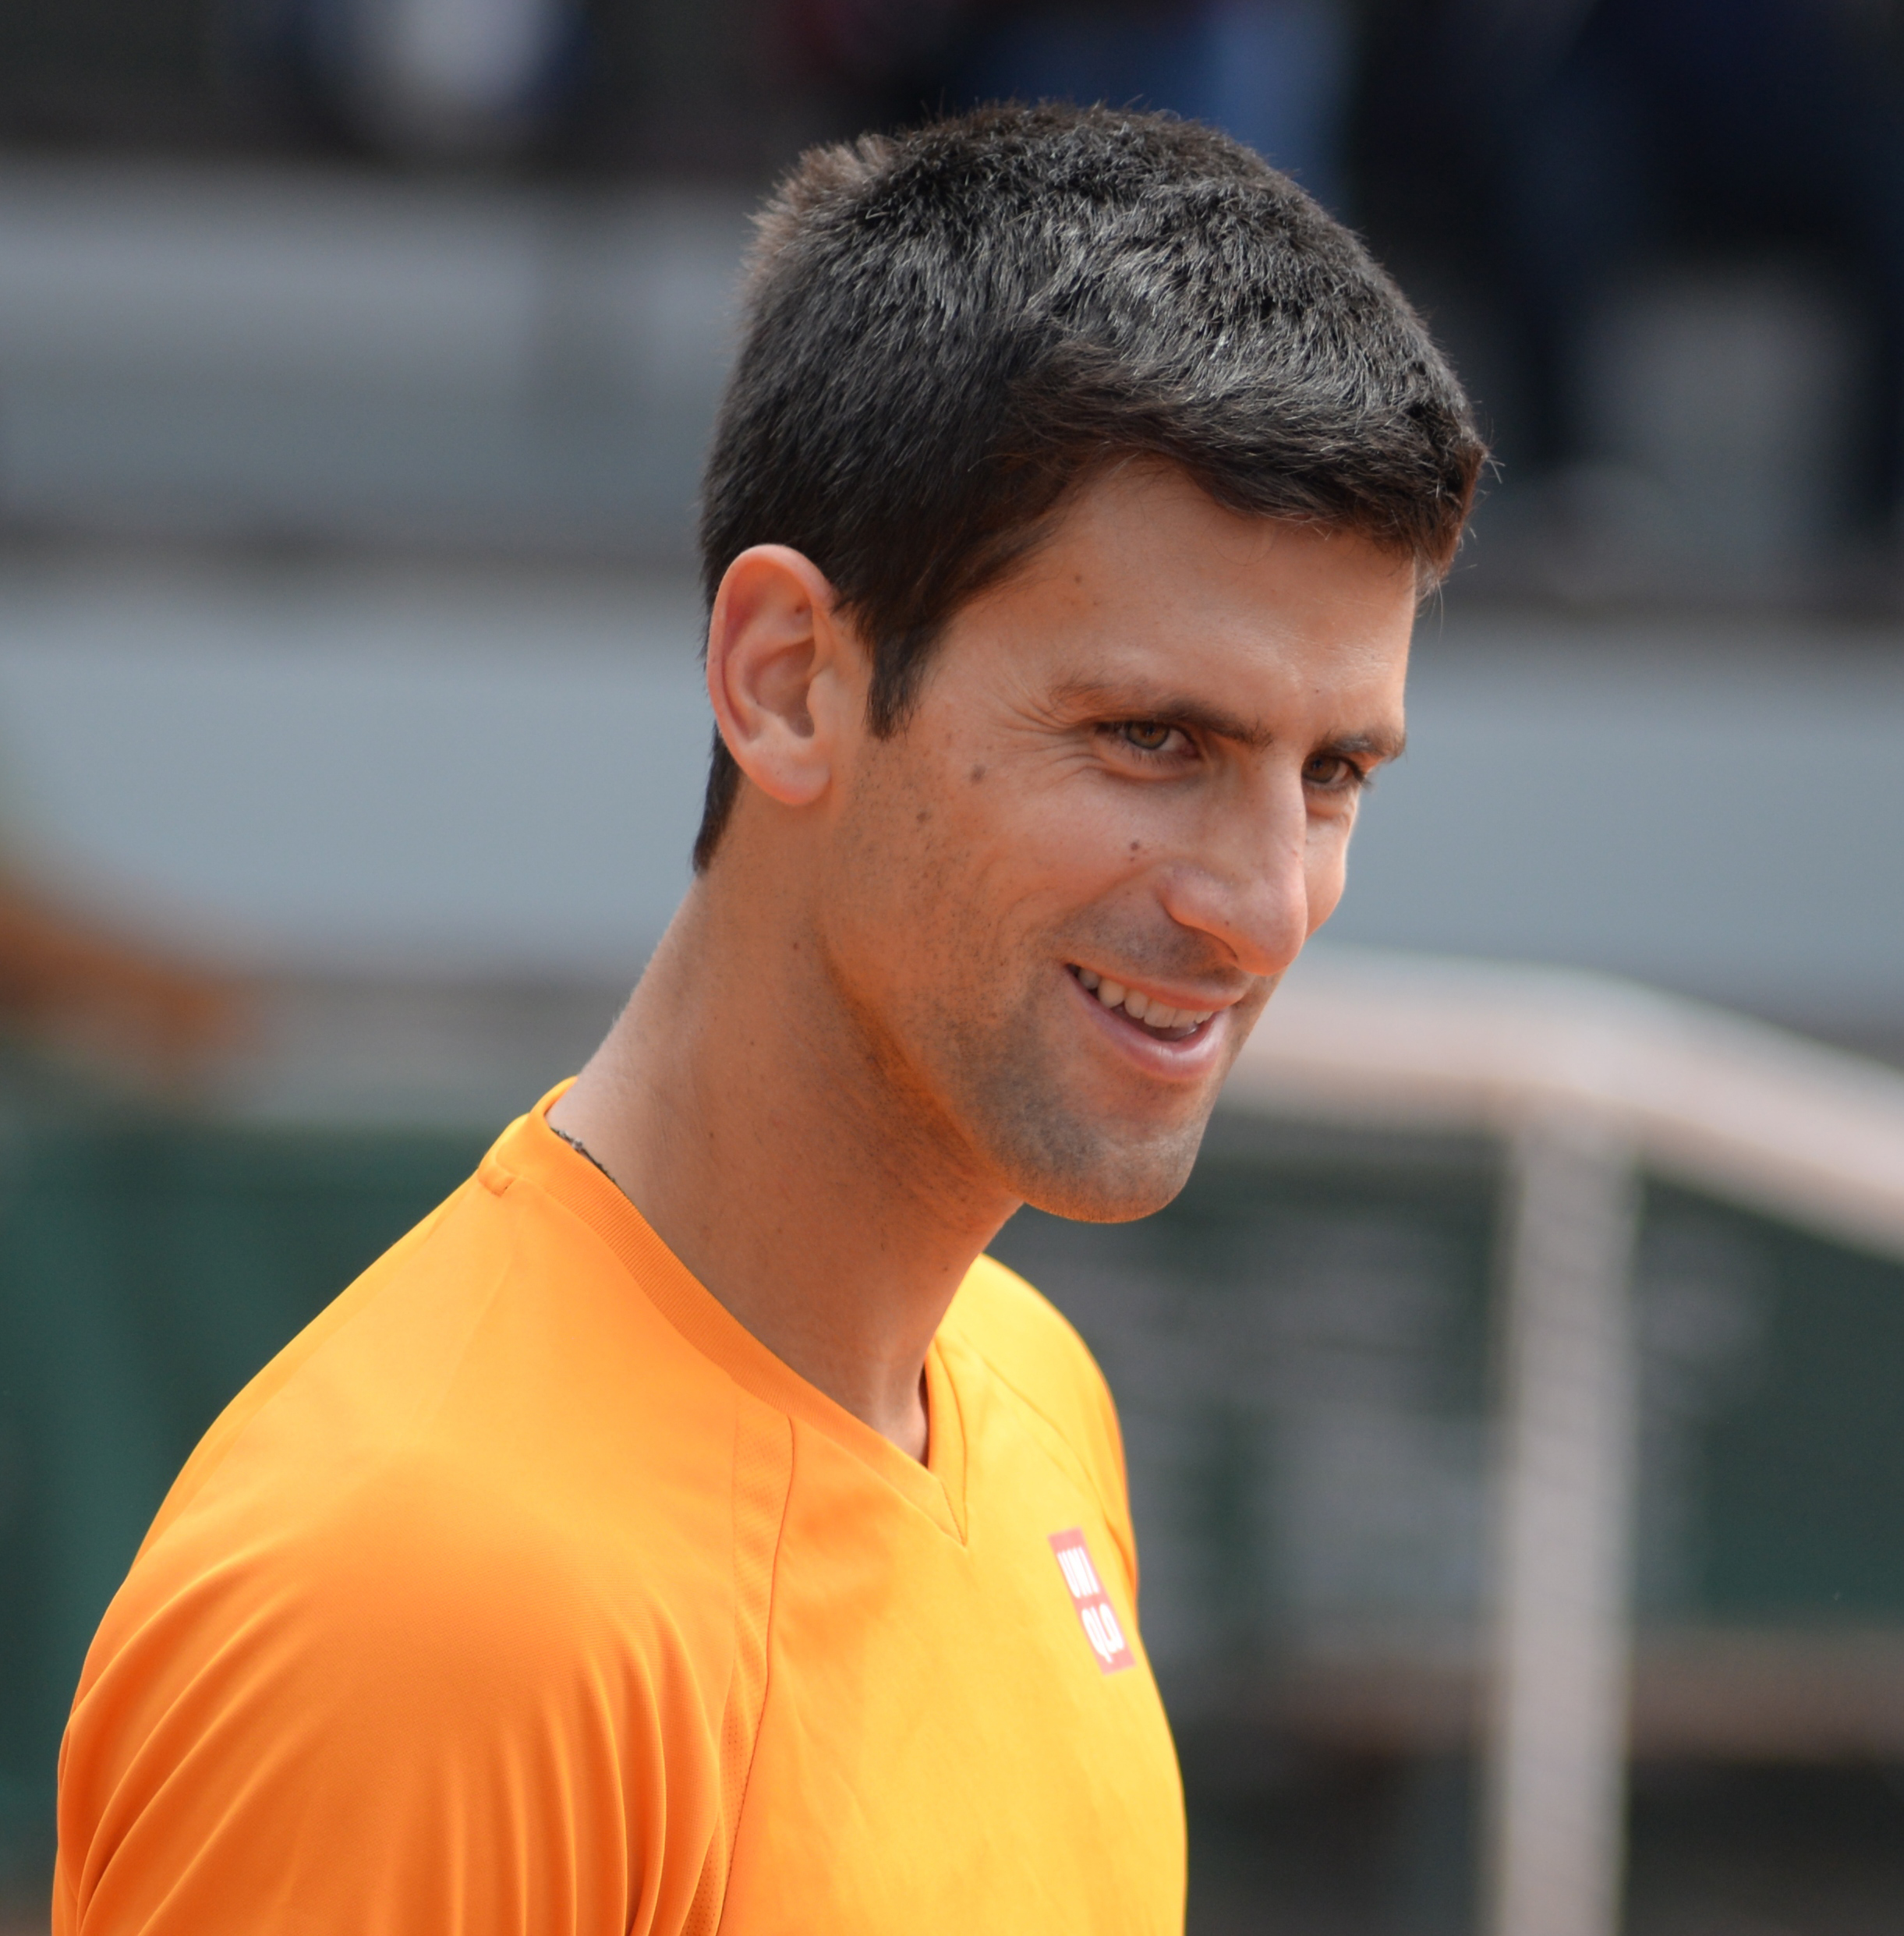 Novak Djokovic U0026 39 S Comment Shows Why A Business Case